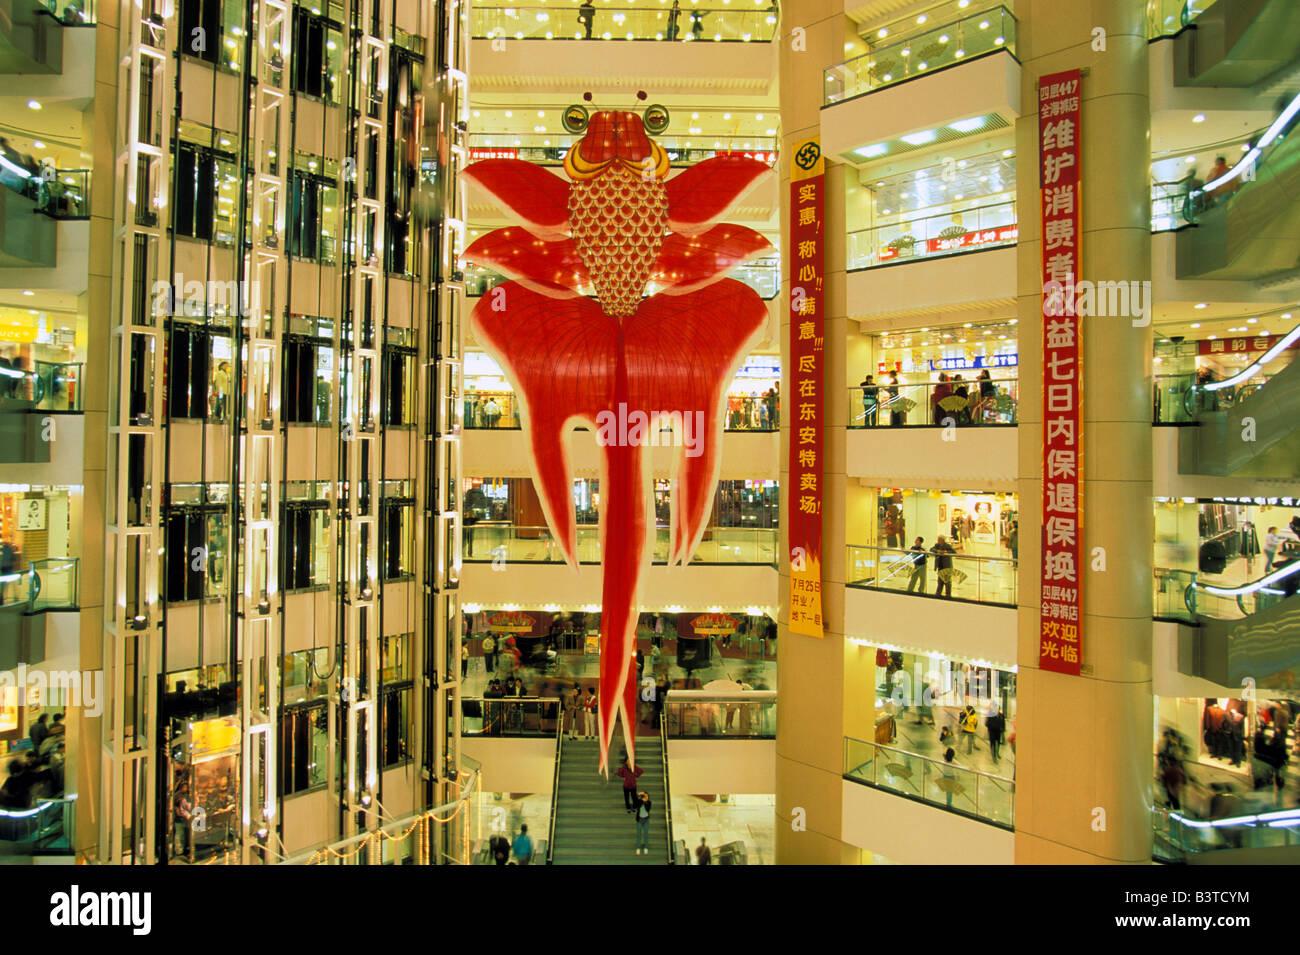 b3930326f0f197 Shoe Shop China Stock Photos   Shoe Shop China Stock Images - Alamy